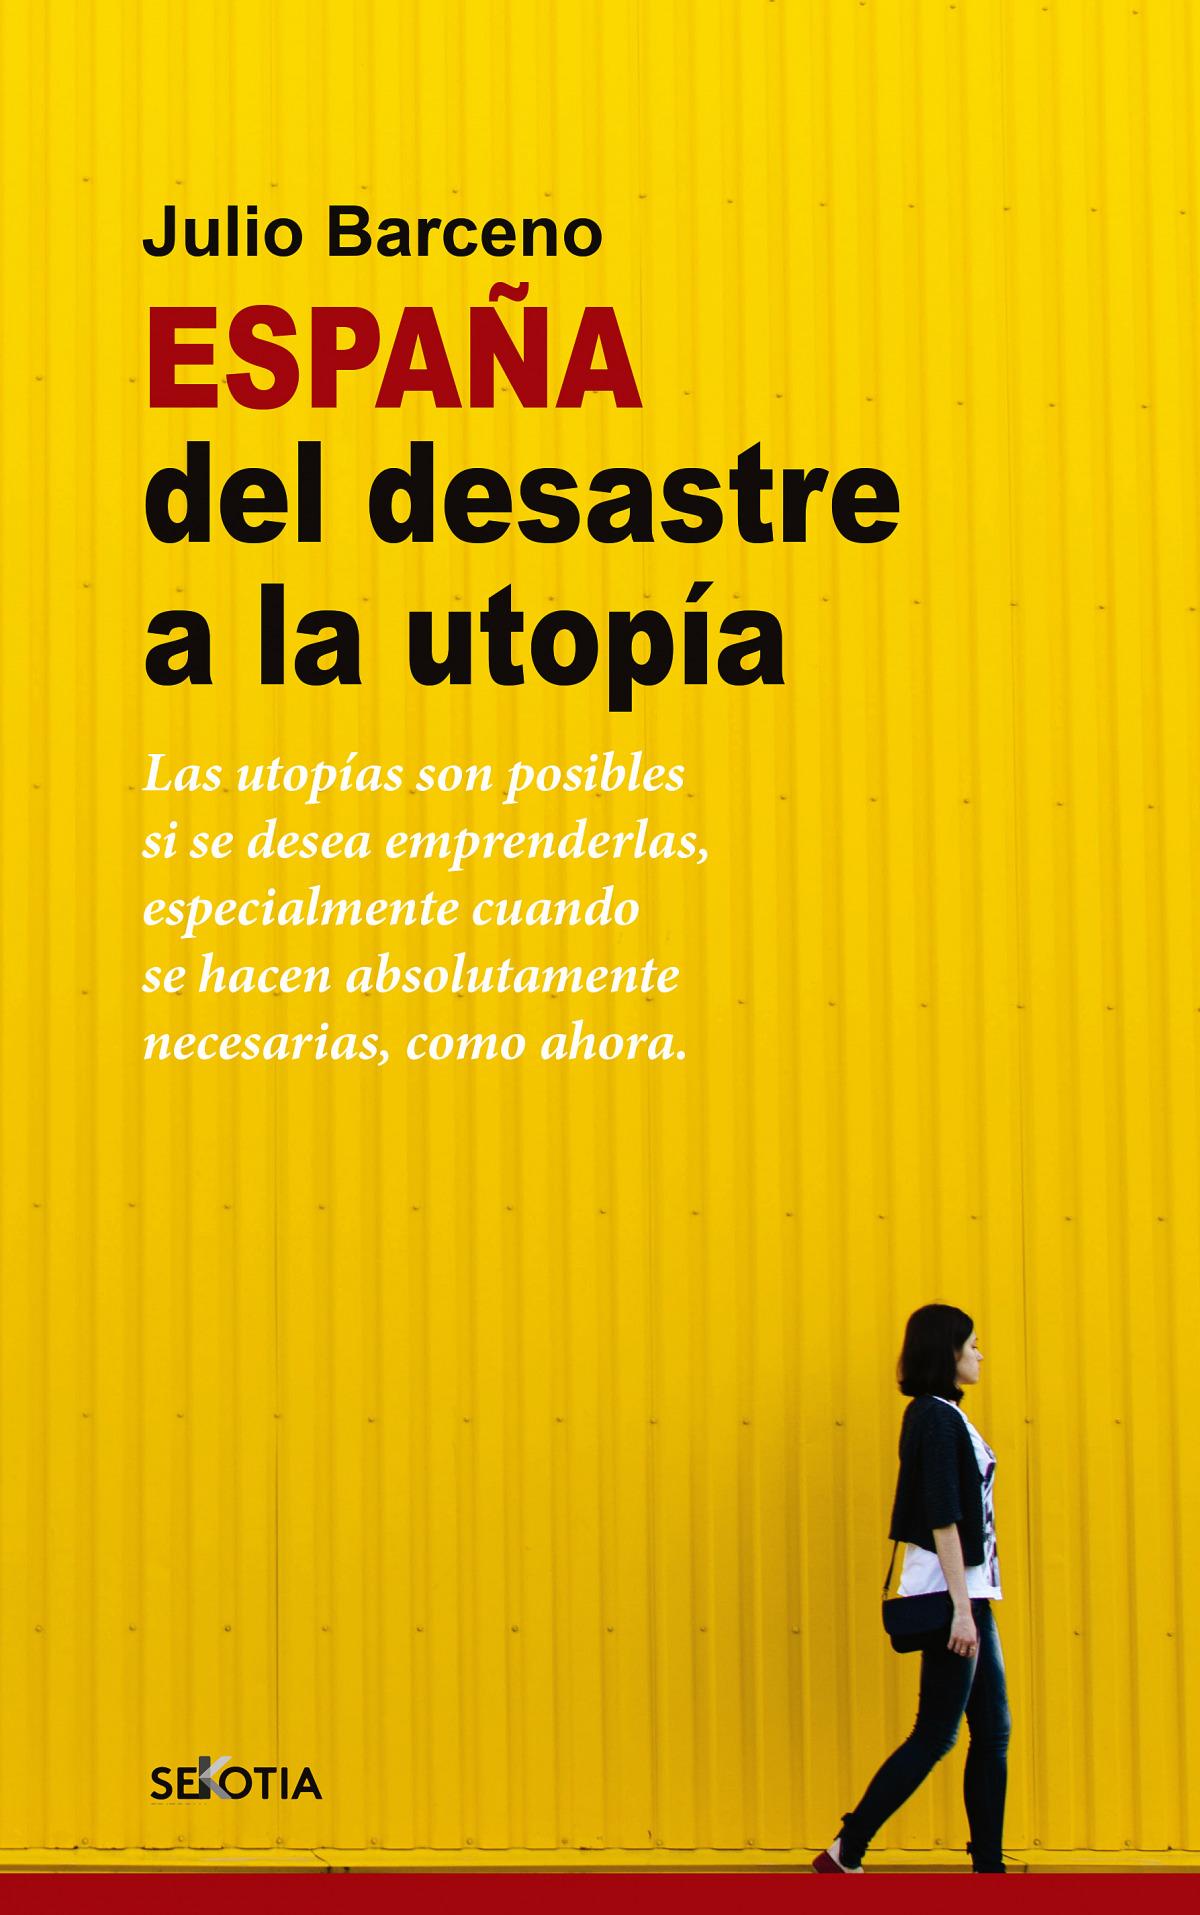 ESPAÑA DEL DESASTRE A LA UTOPIA